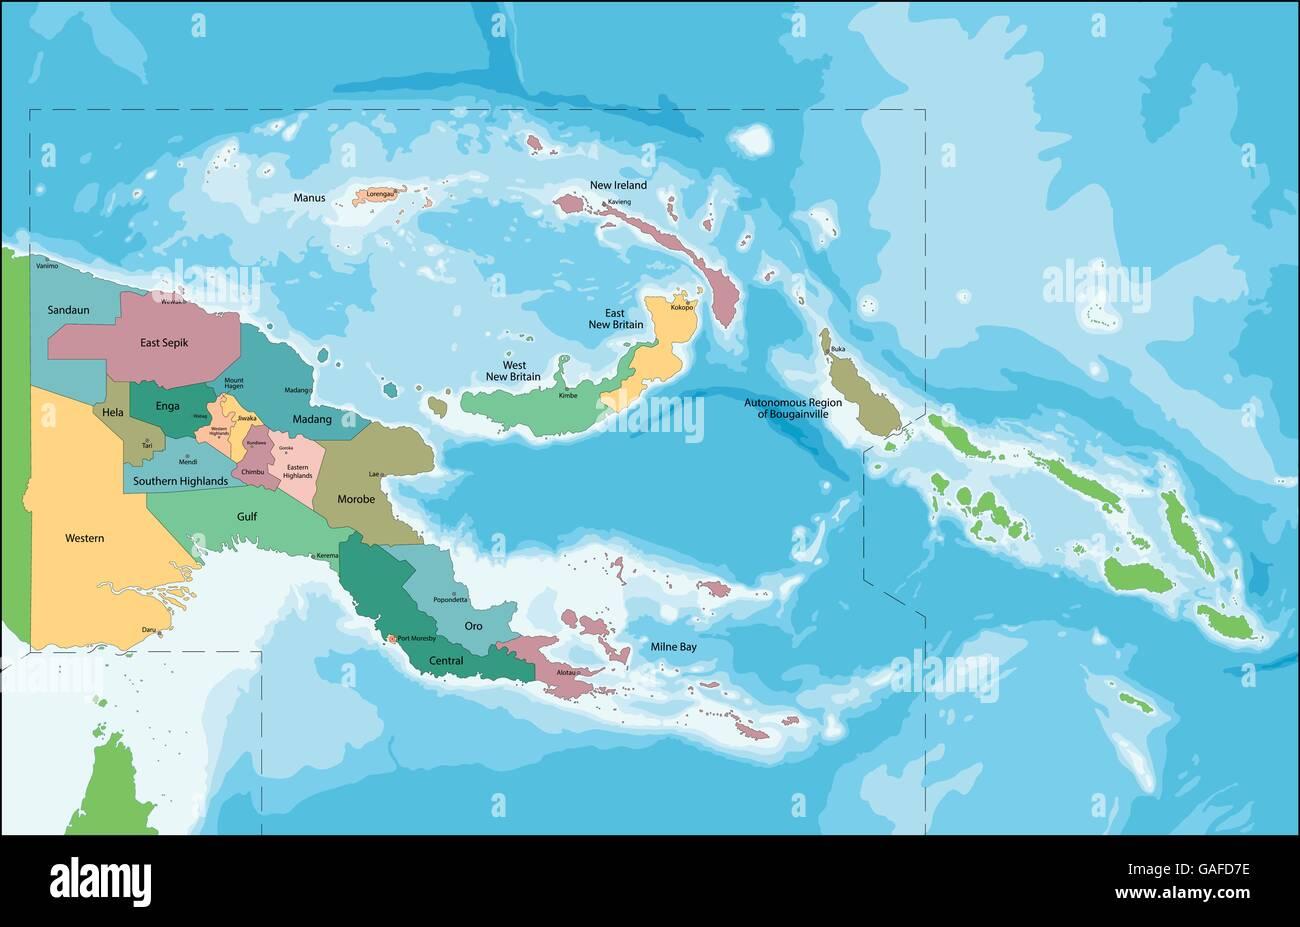 Papua New Guinea map Stock Vector Art & Illustration, Vector ...